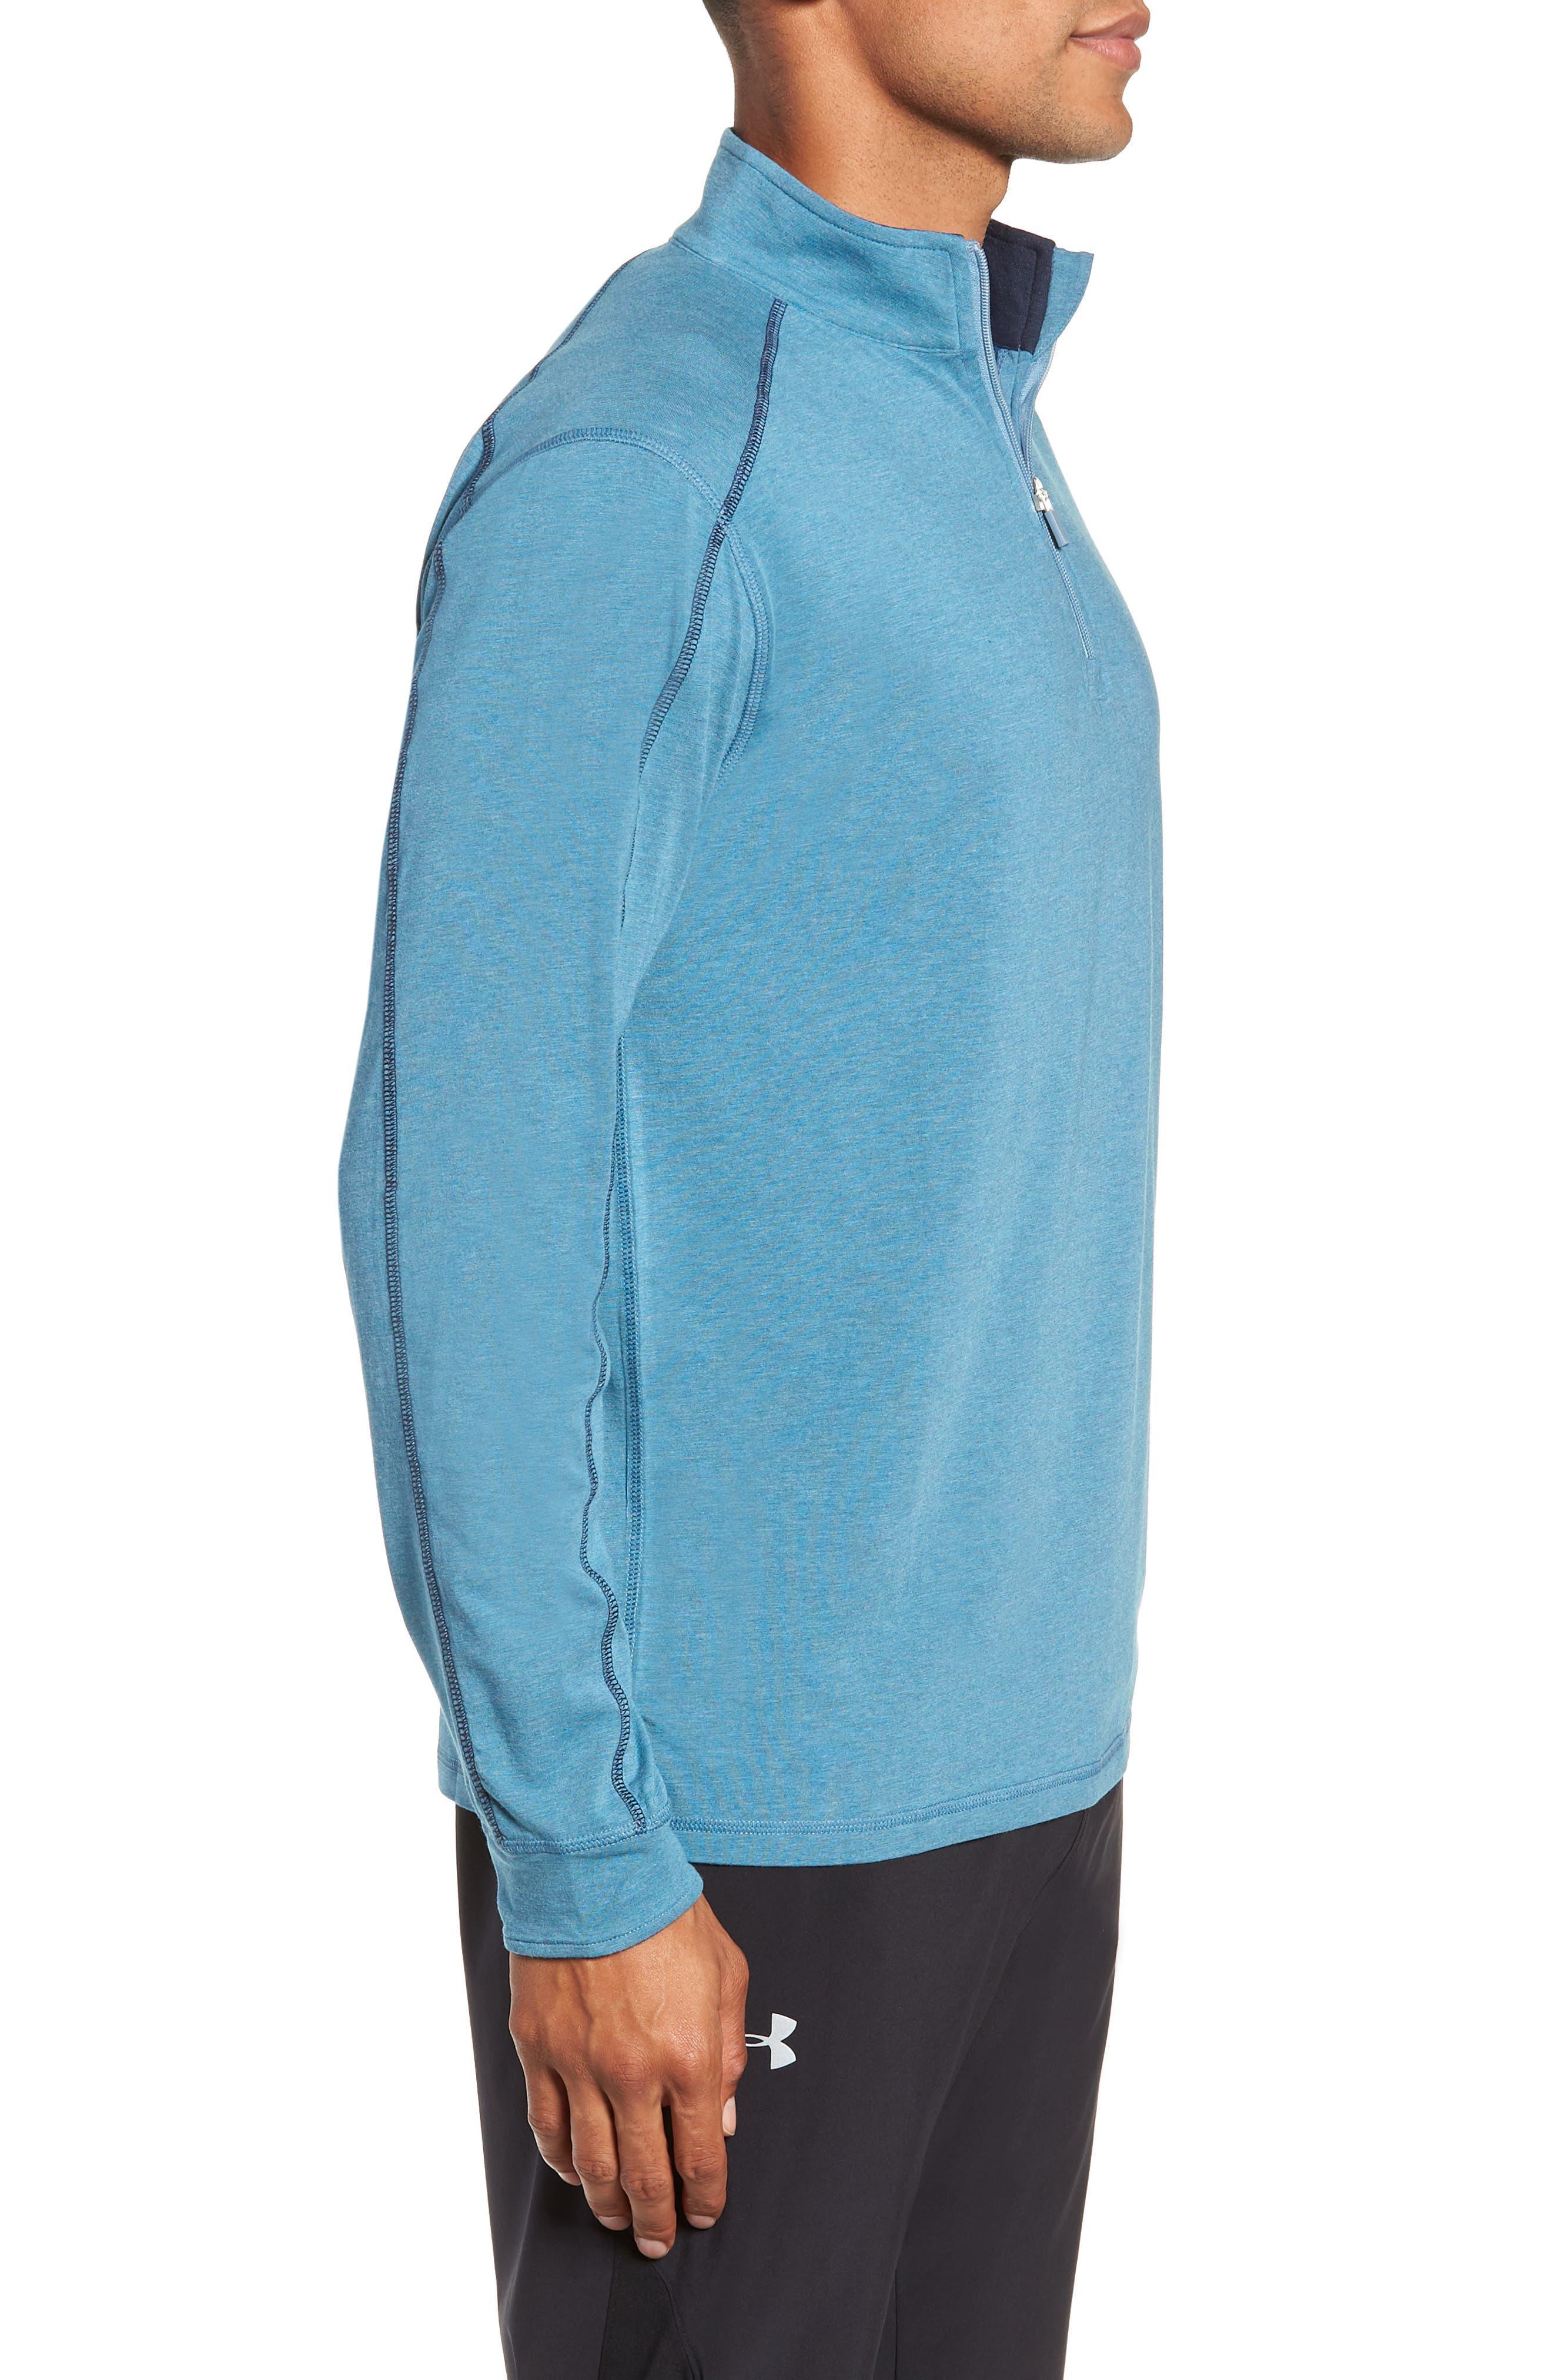 Carrollton Quarter Zip Sweatshirt,                             Alternate thumbnail 4, color,                             Tranquility Sea Heather